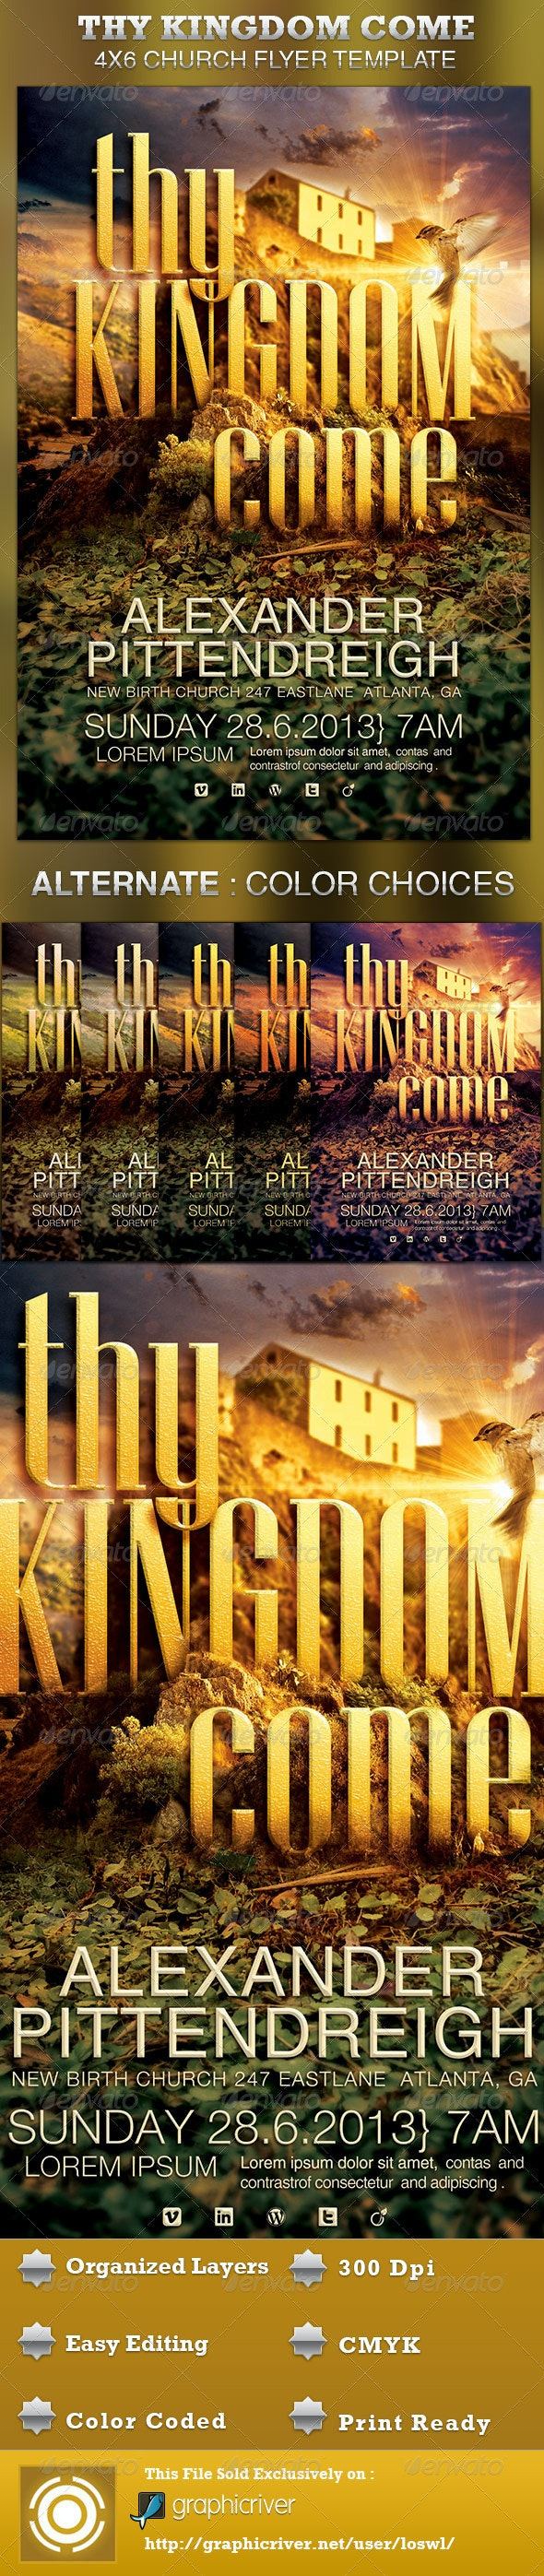 Thy Kingdom Come Church Flyer Template - Church Flyers